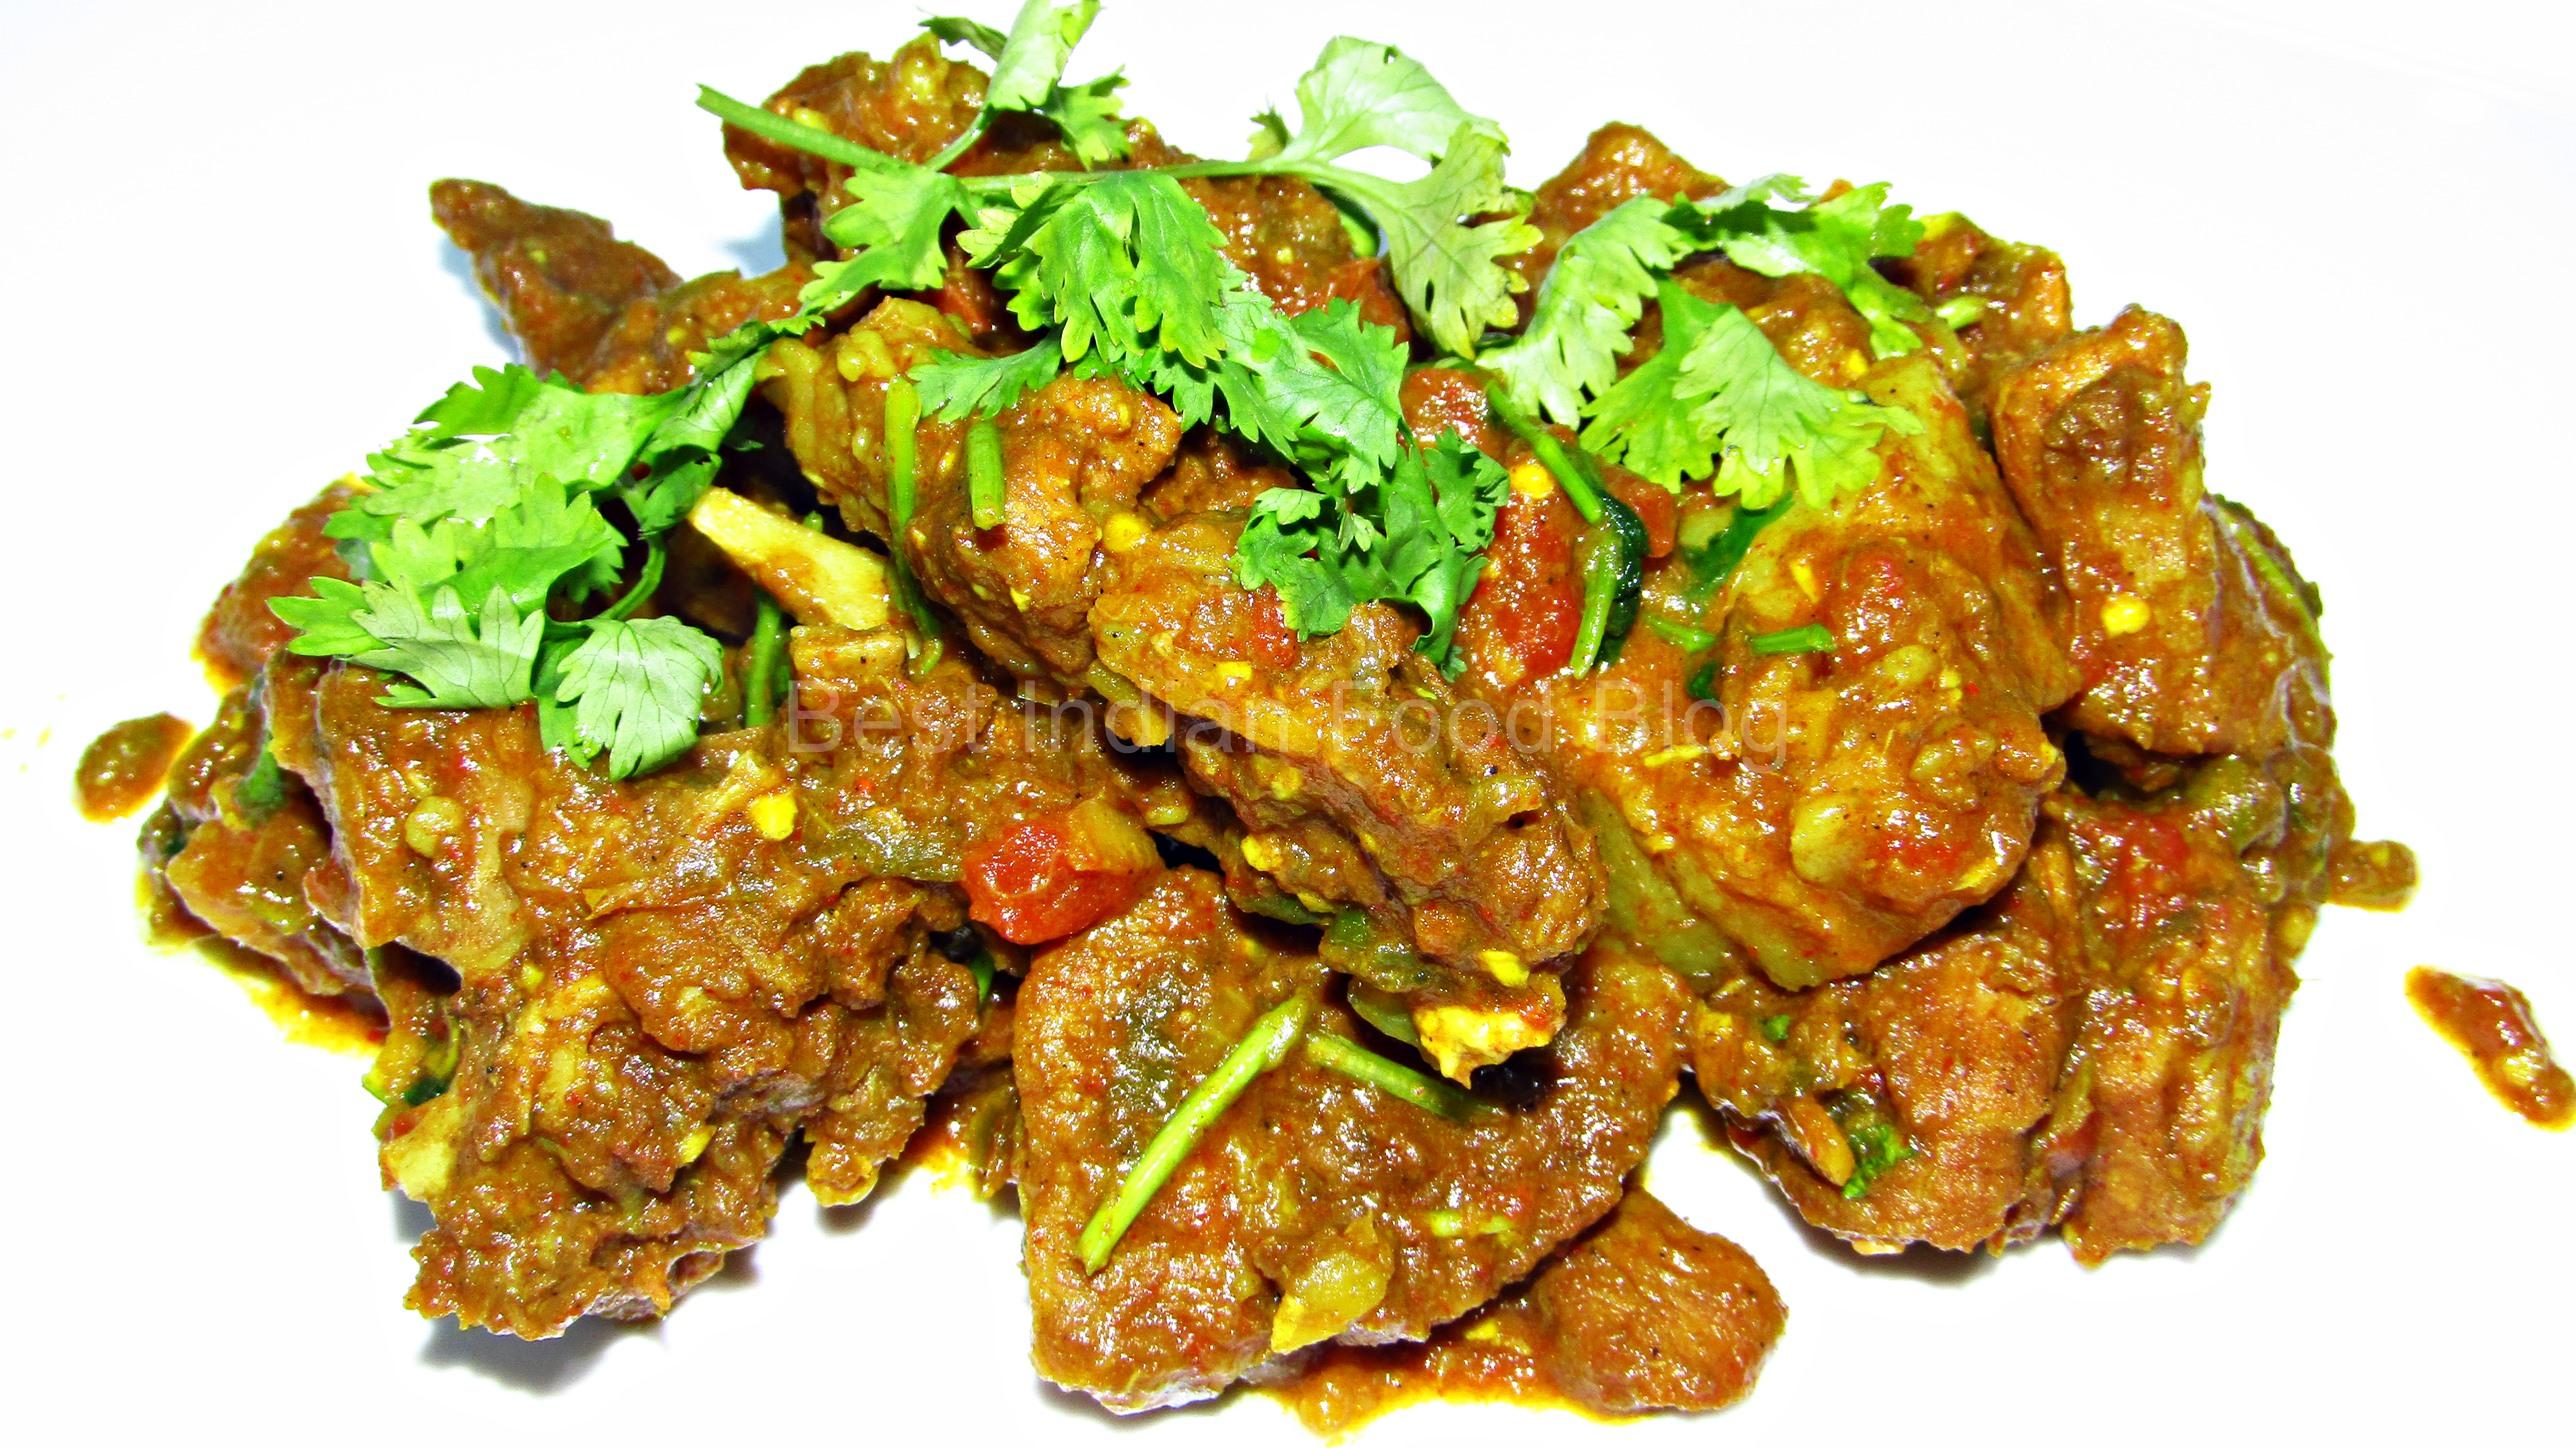 Dhukor Upkri from Daman and Diu | Best Indian Food Blog | Pork recipe